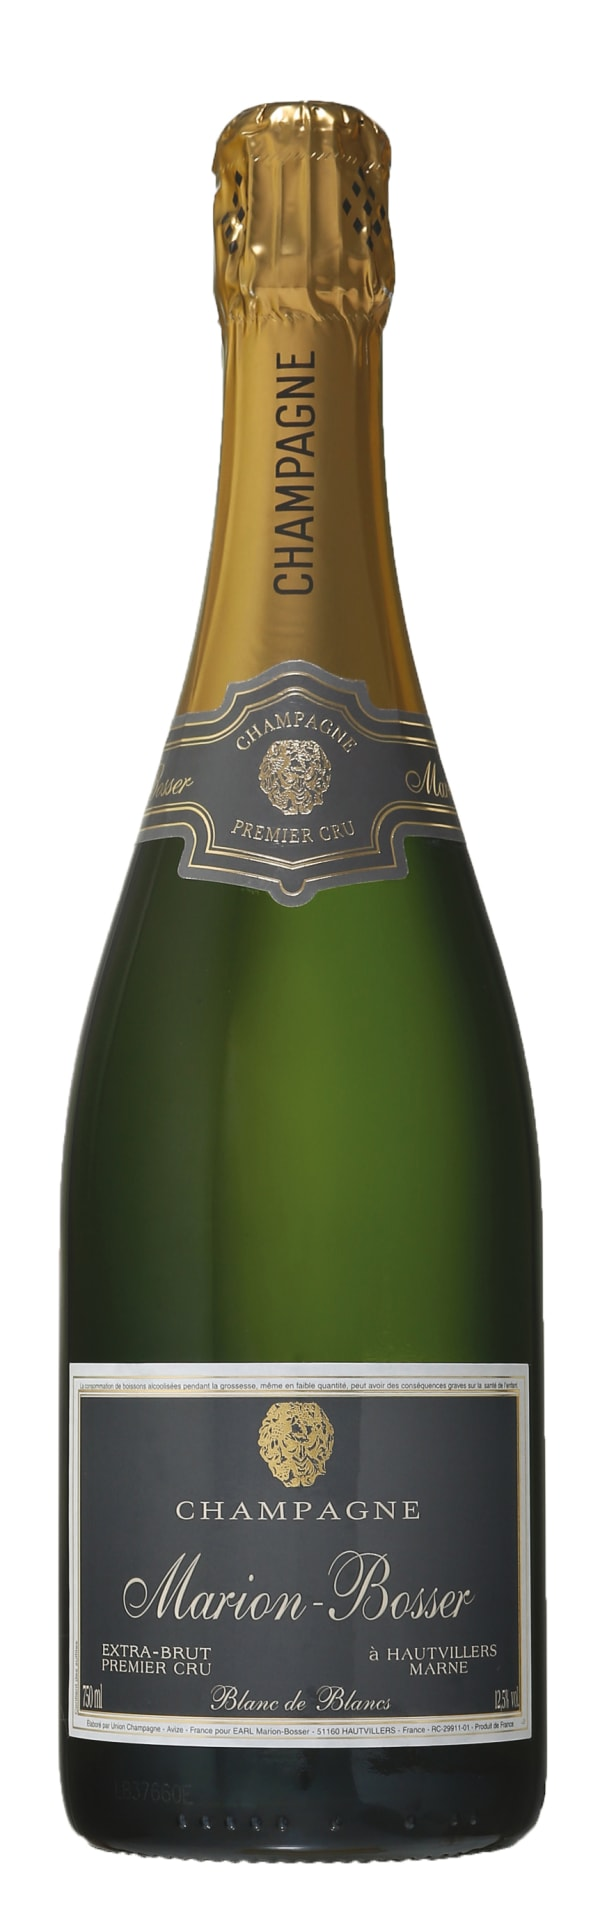 Marion-Bosser Premier Cru Champagne Extra Brut